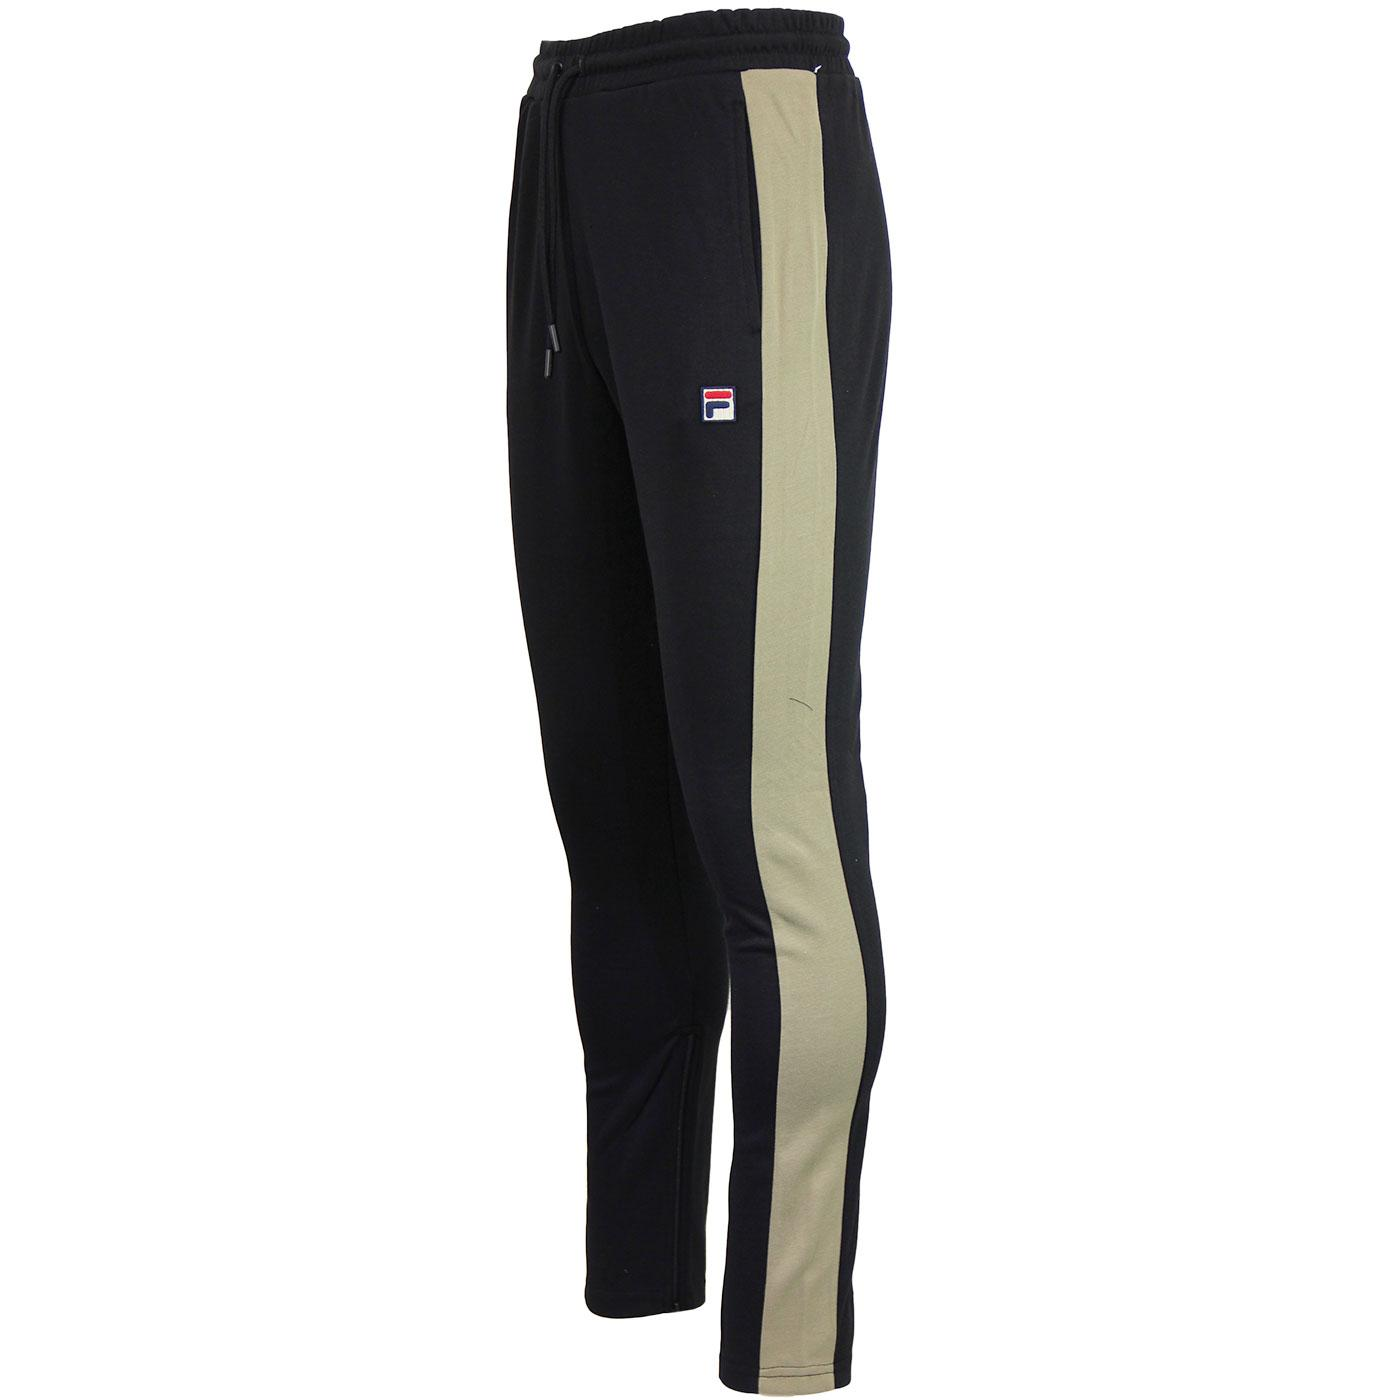 Setter FILA Vintage 1970s Stripe Track Pants BLACK